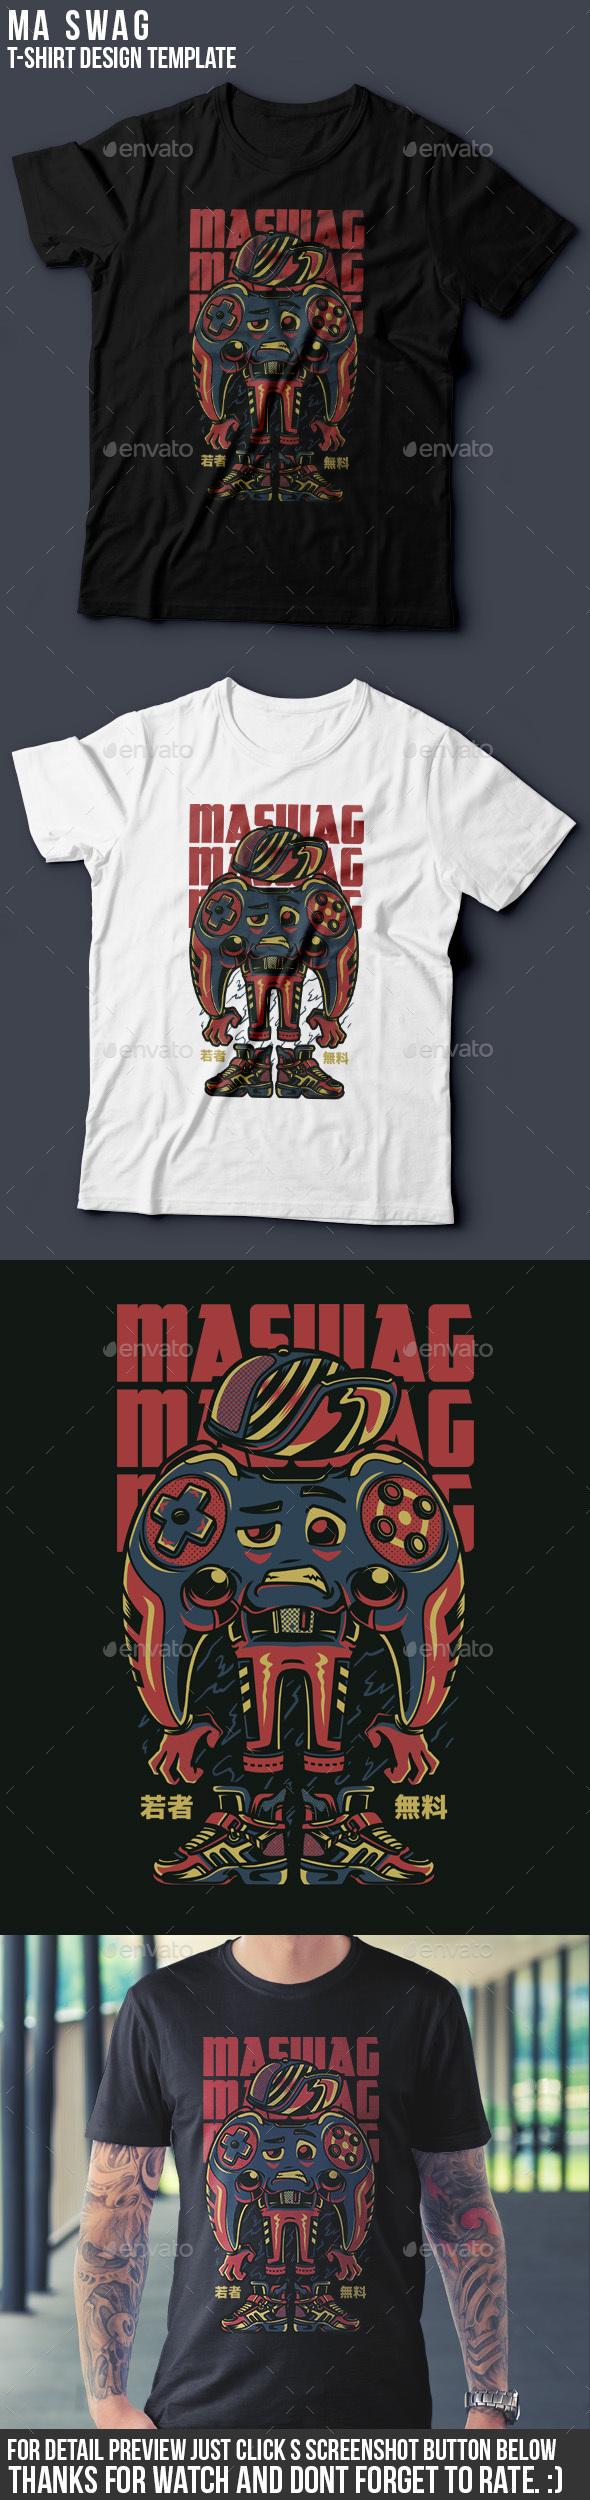 Maswag T-Shirt Design